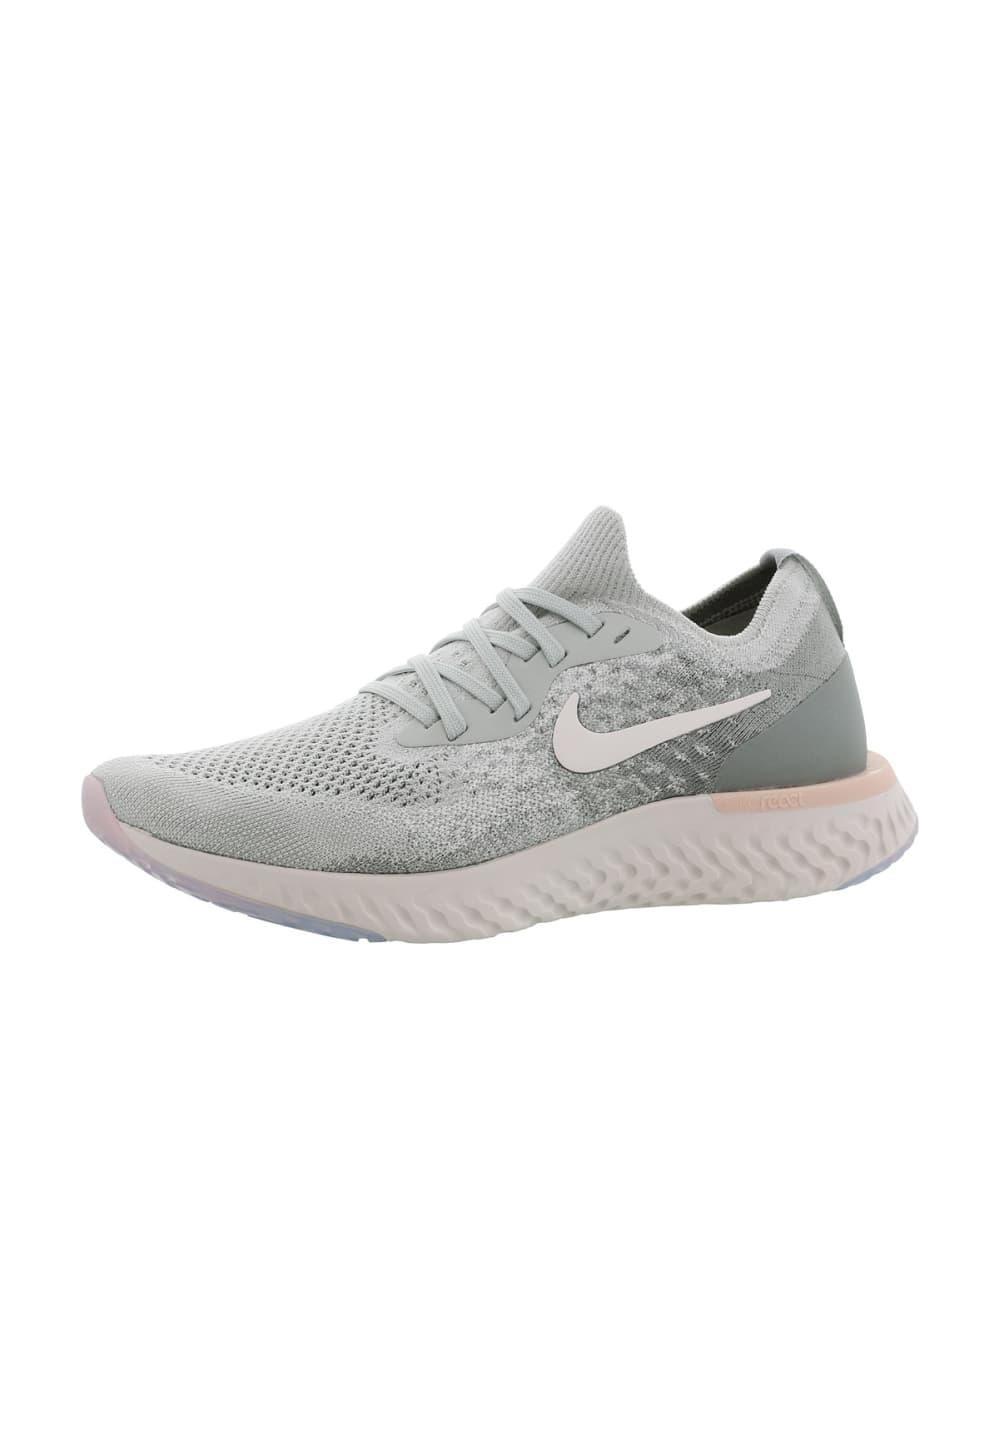 fcfbbdc3a00c Nike Odyssey React - Running shoes for Women - Grey